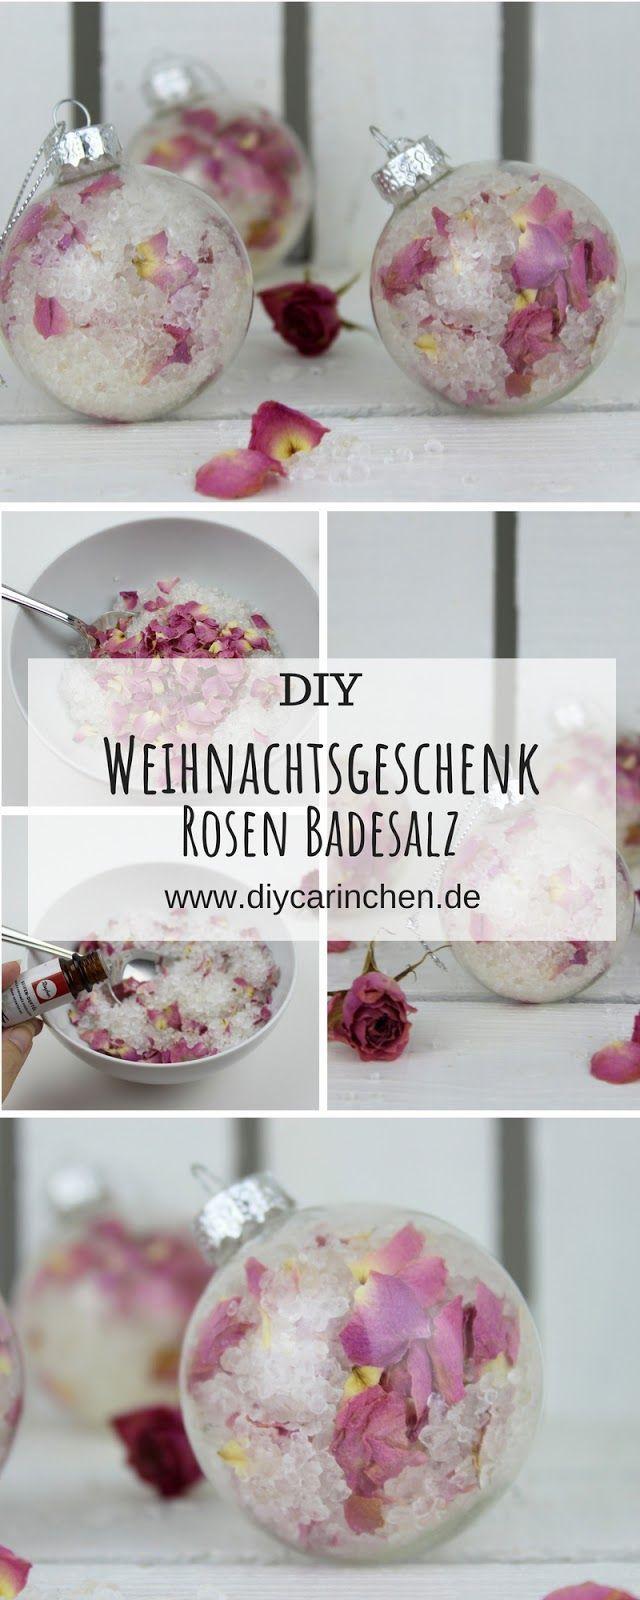 Photo of DIY bath salts with rose petals in Christmas tree balls